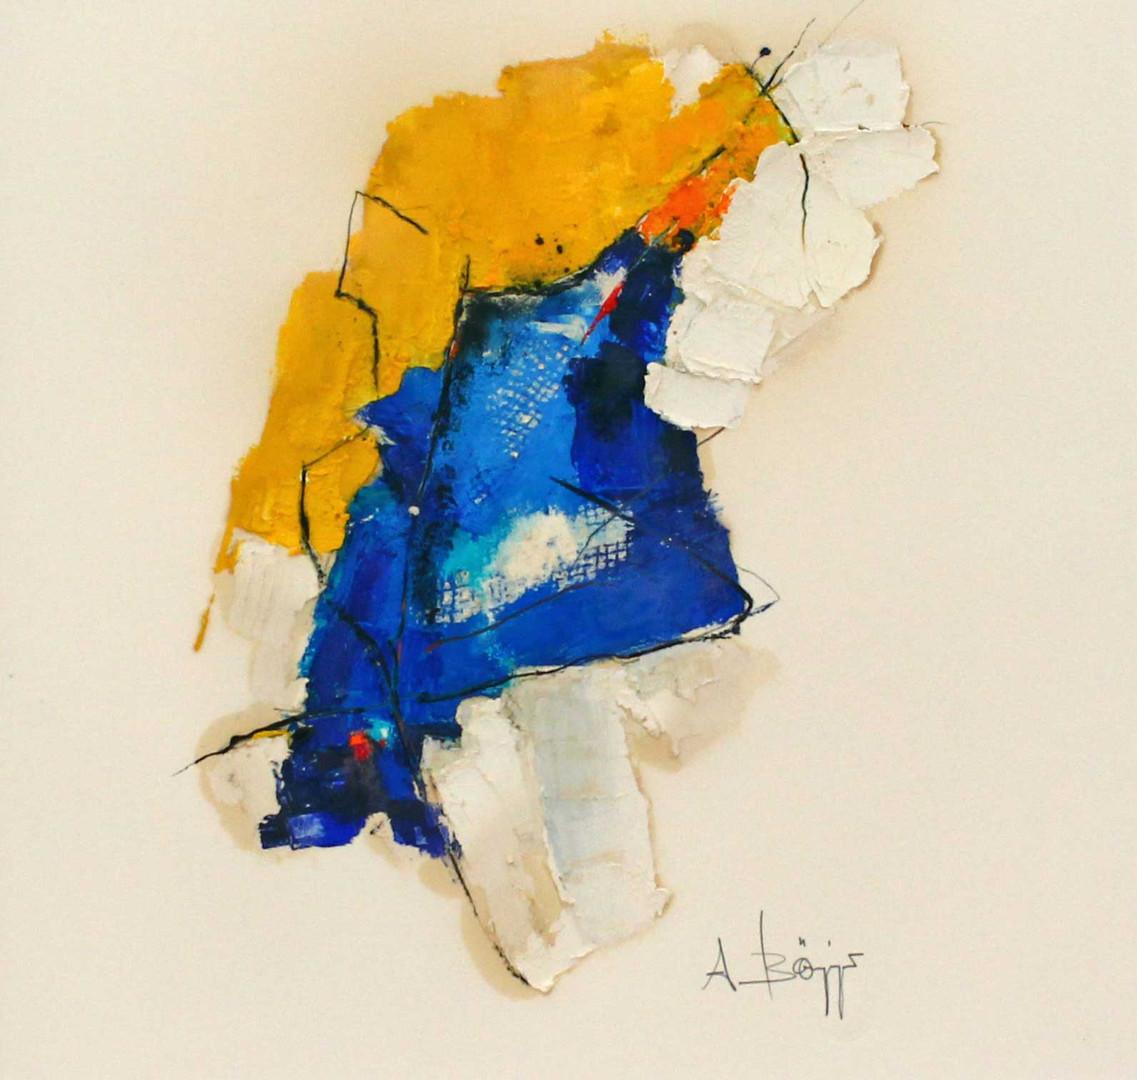 ALBERT-BAENZIGER--70x70.jpg